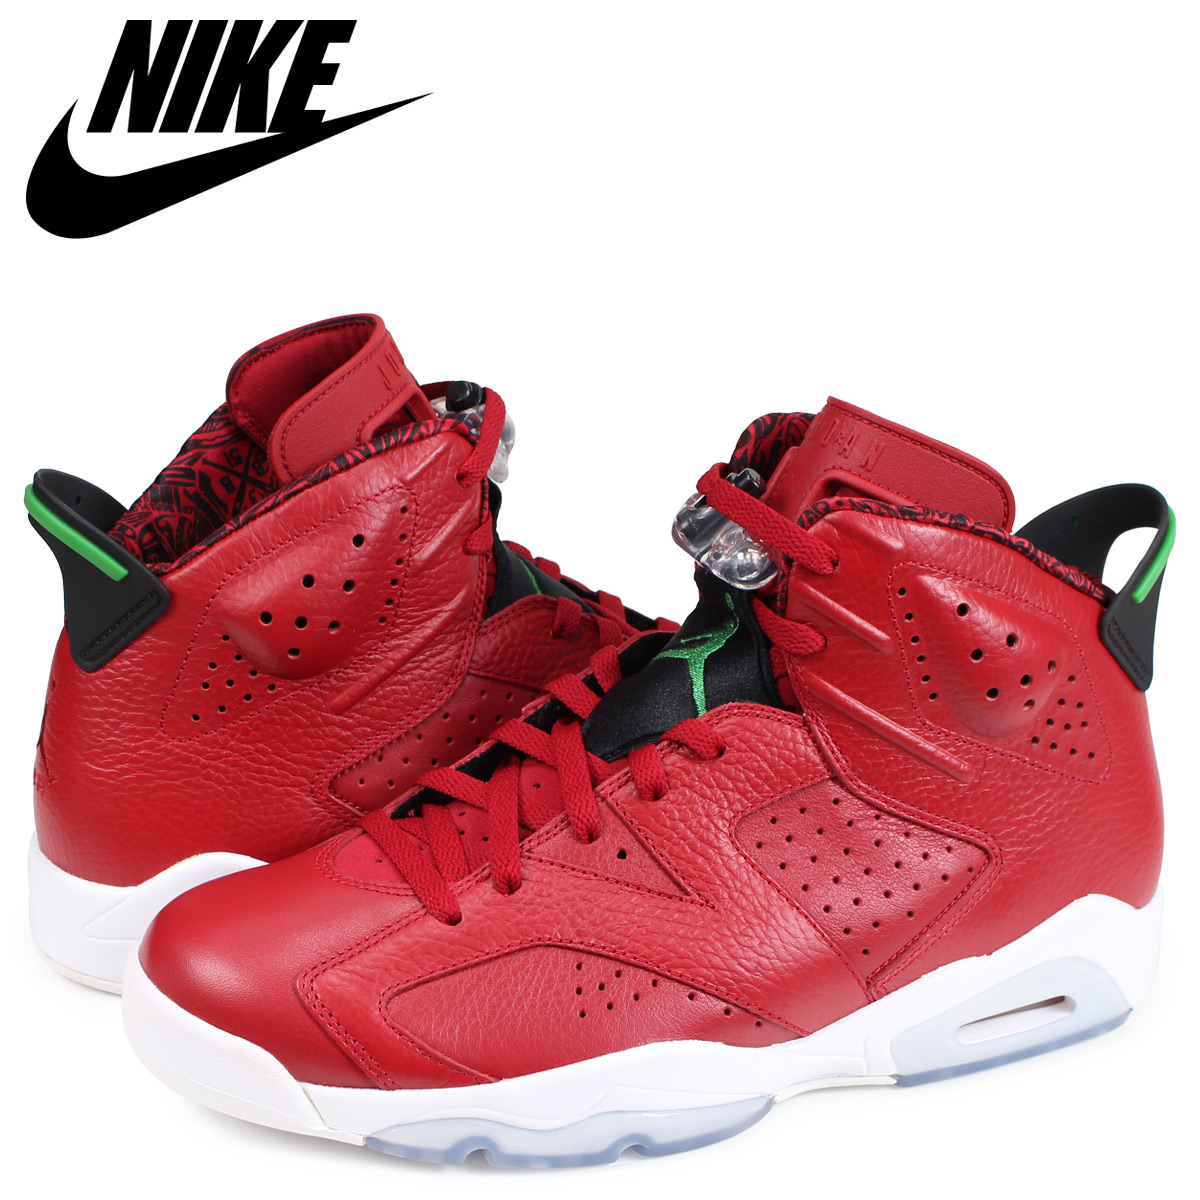 8e4bf6fccea5 NIKE AIR JORDAN 6 RETRO SPIZIKE Nike Air Jordan 6 nostalgic sneakers men  red 694